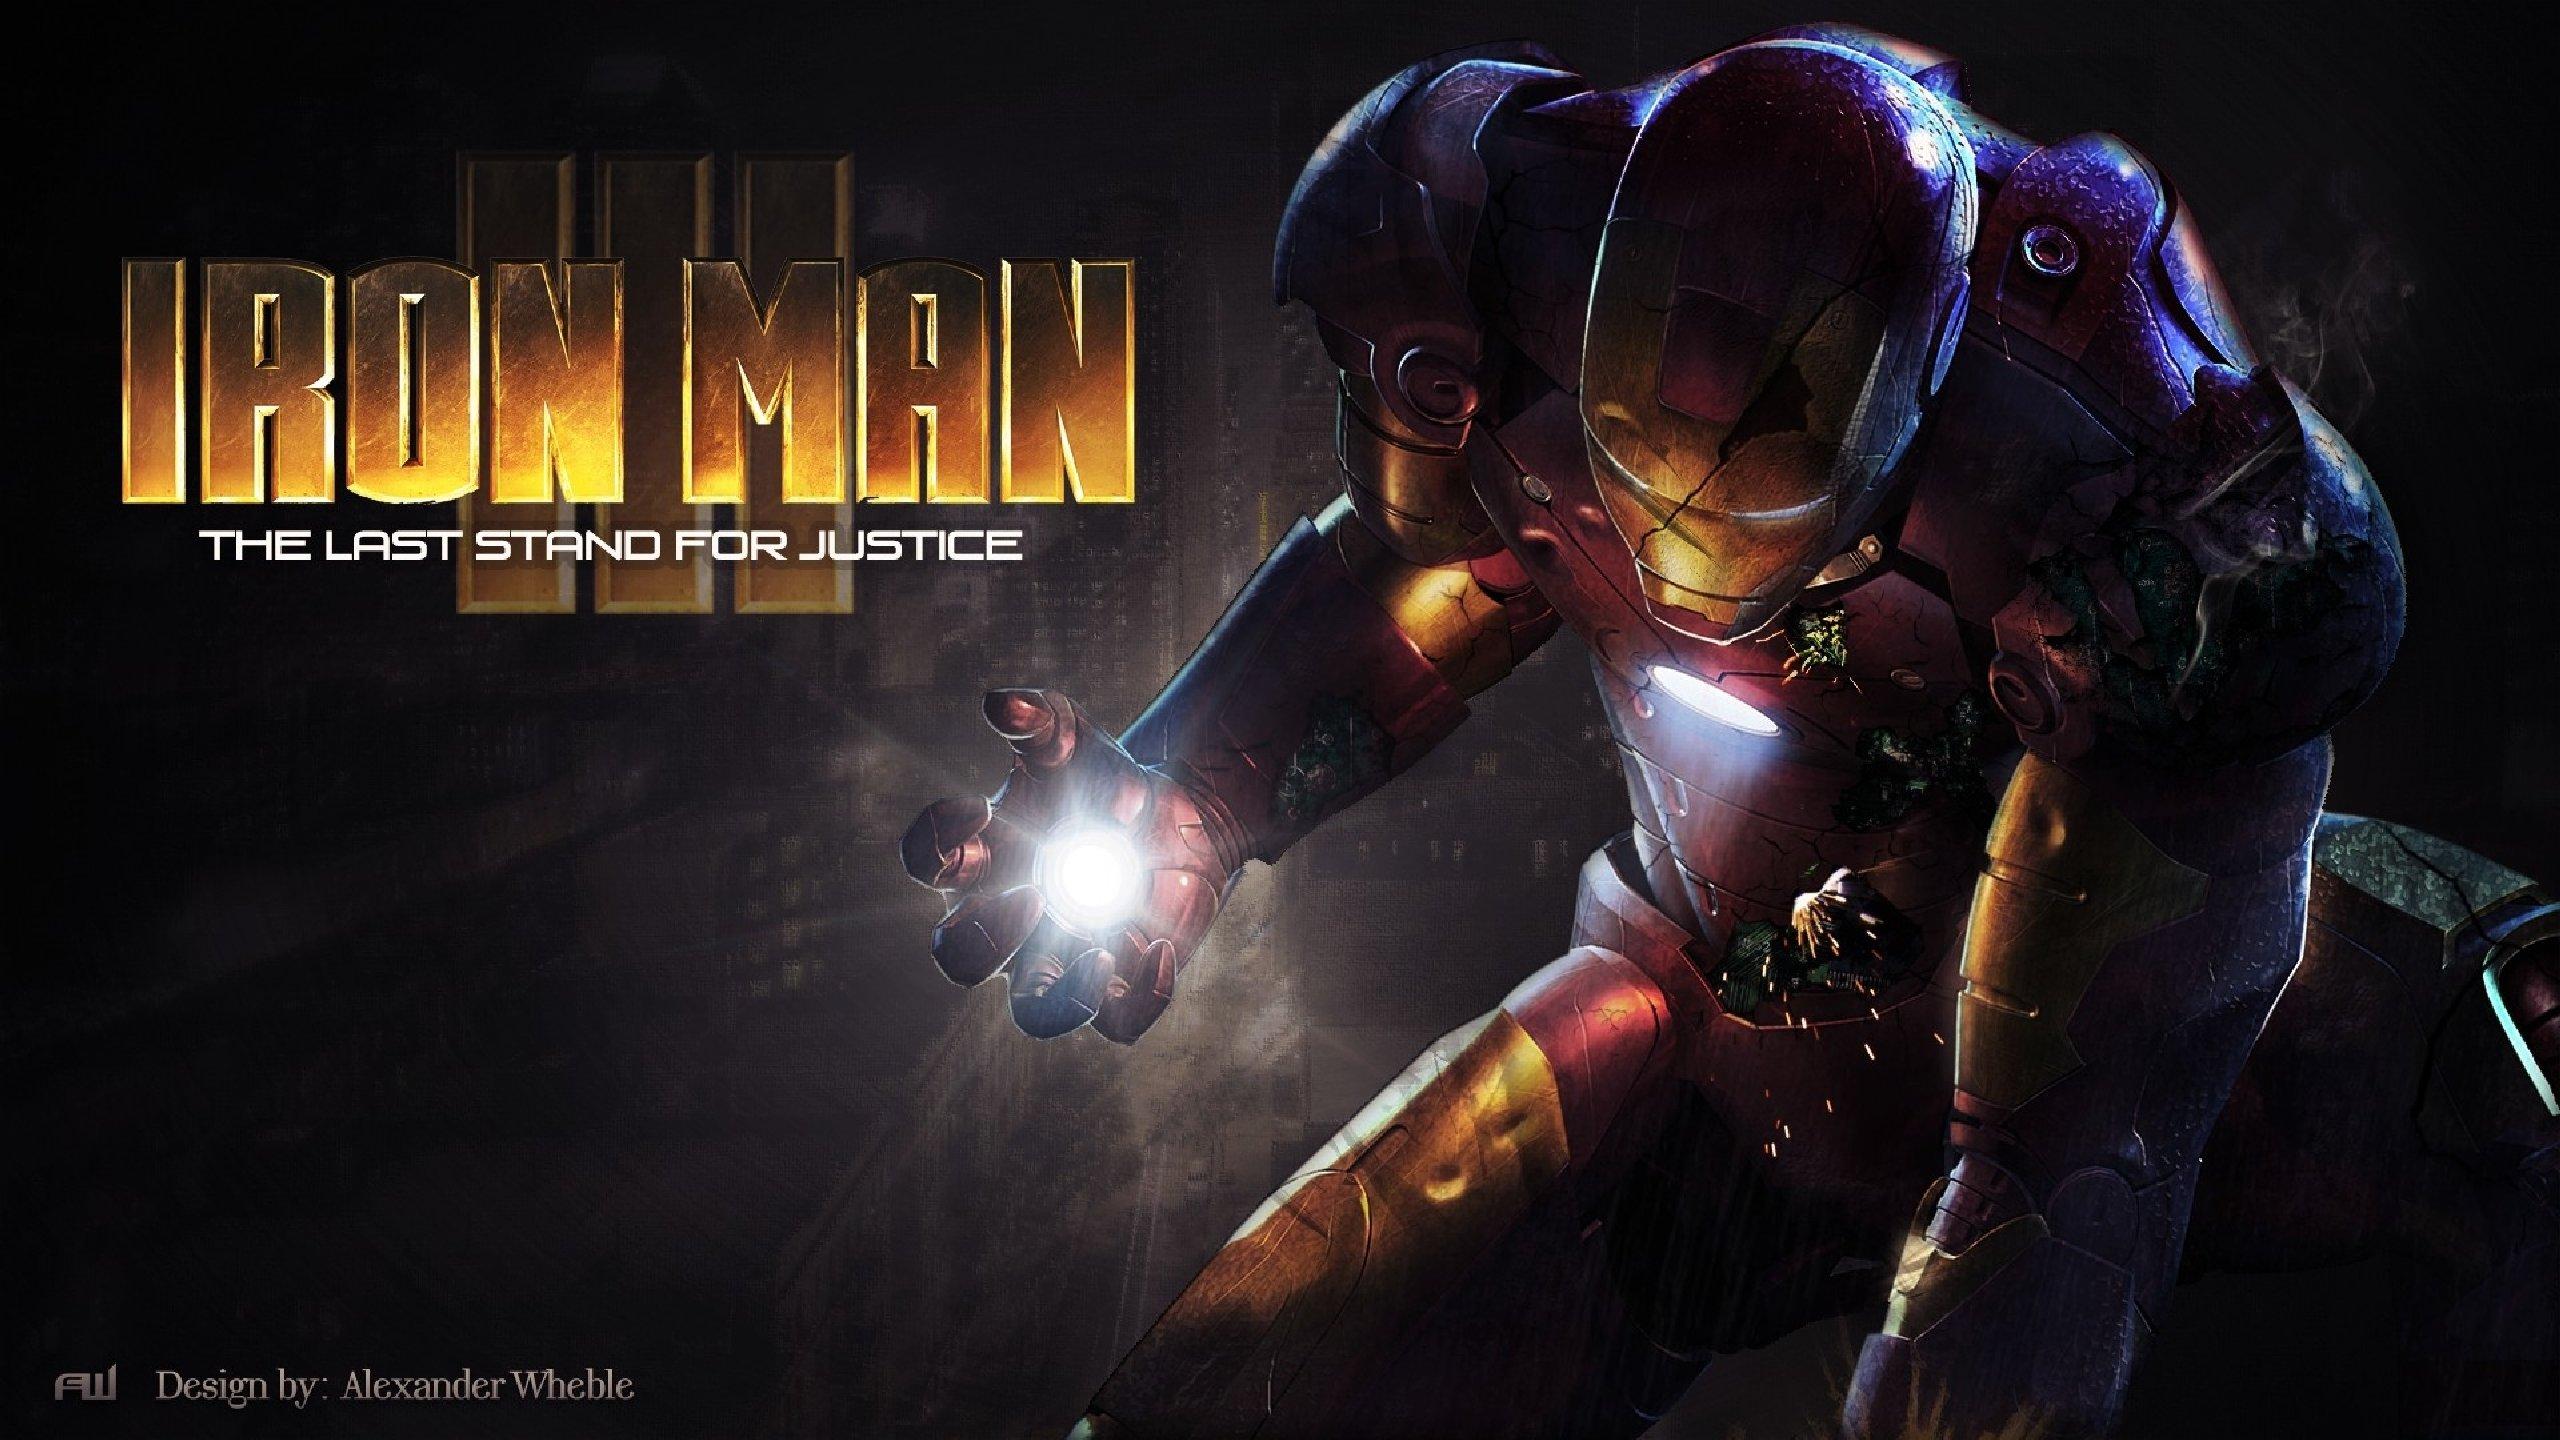 Iron Man Wallpapers 2560x1440 Desktop Backgrounds